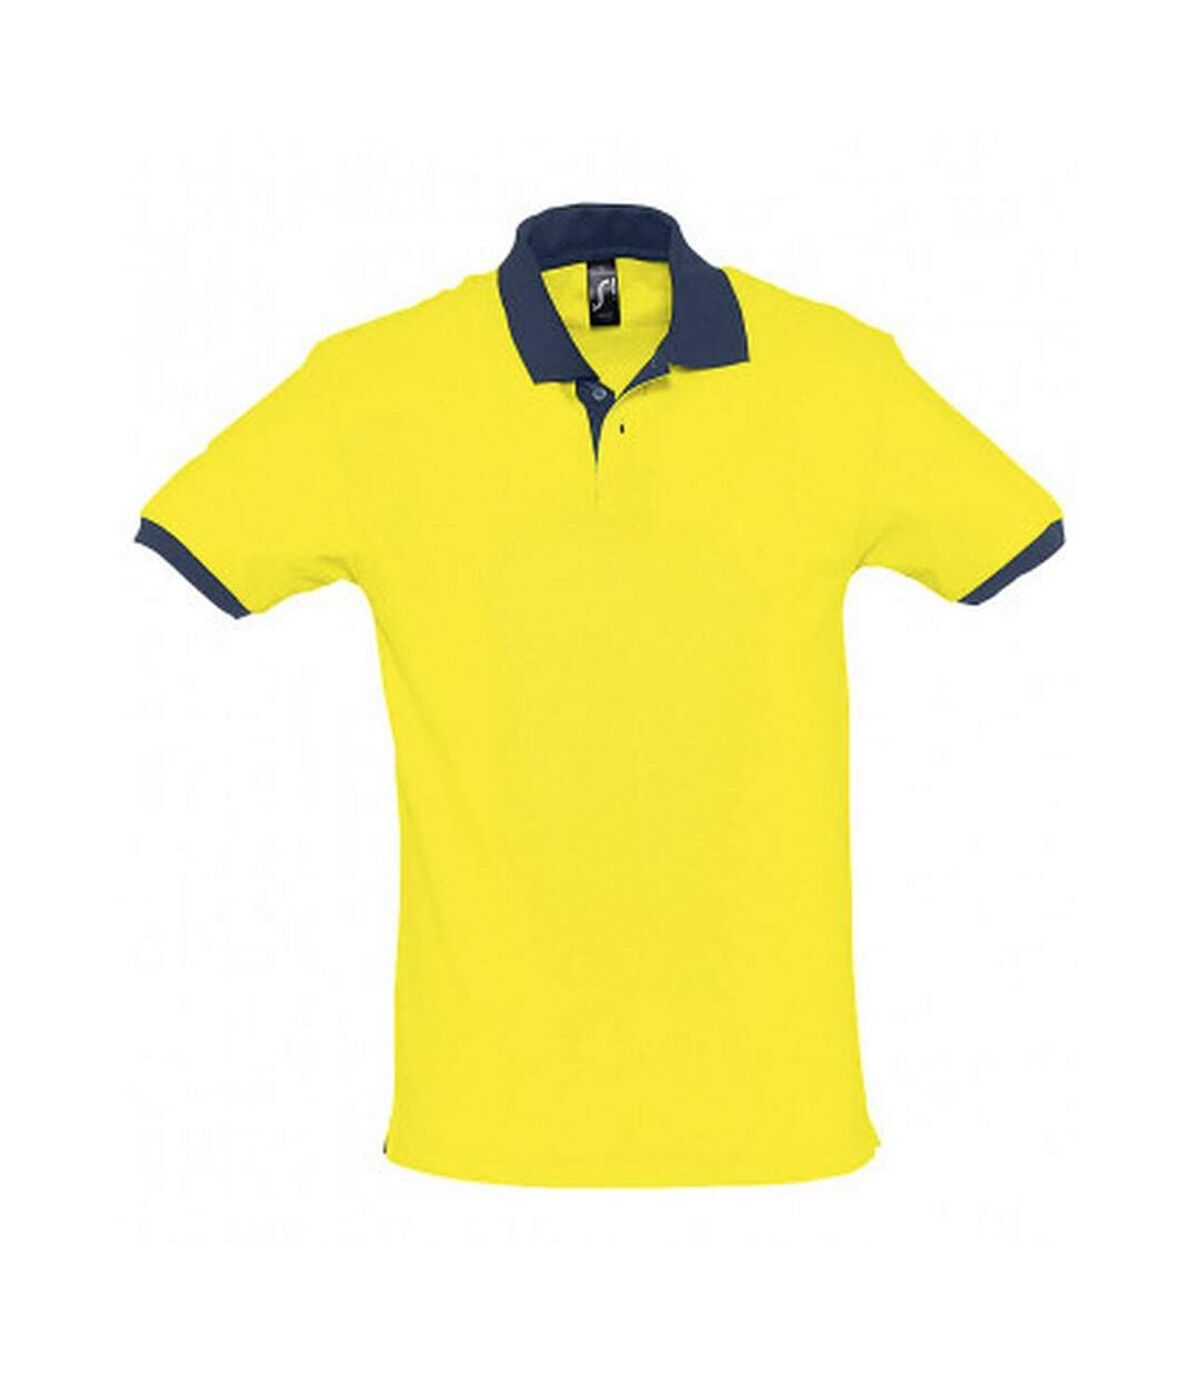 SOLS Prince Unisex Contrast Pique Short Sleeve Cotton Polo Shirt (Lemon/French Navy) - UTPC323